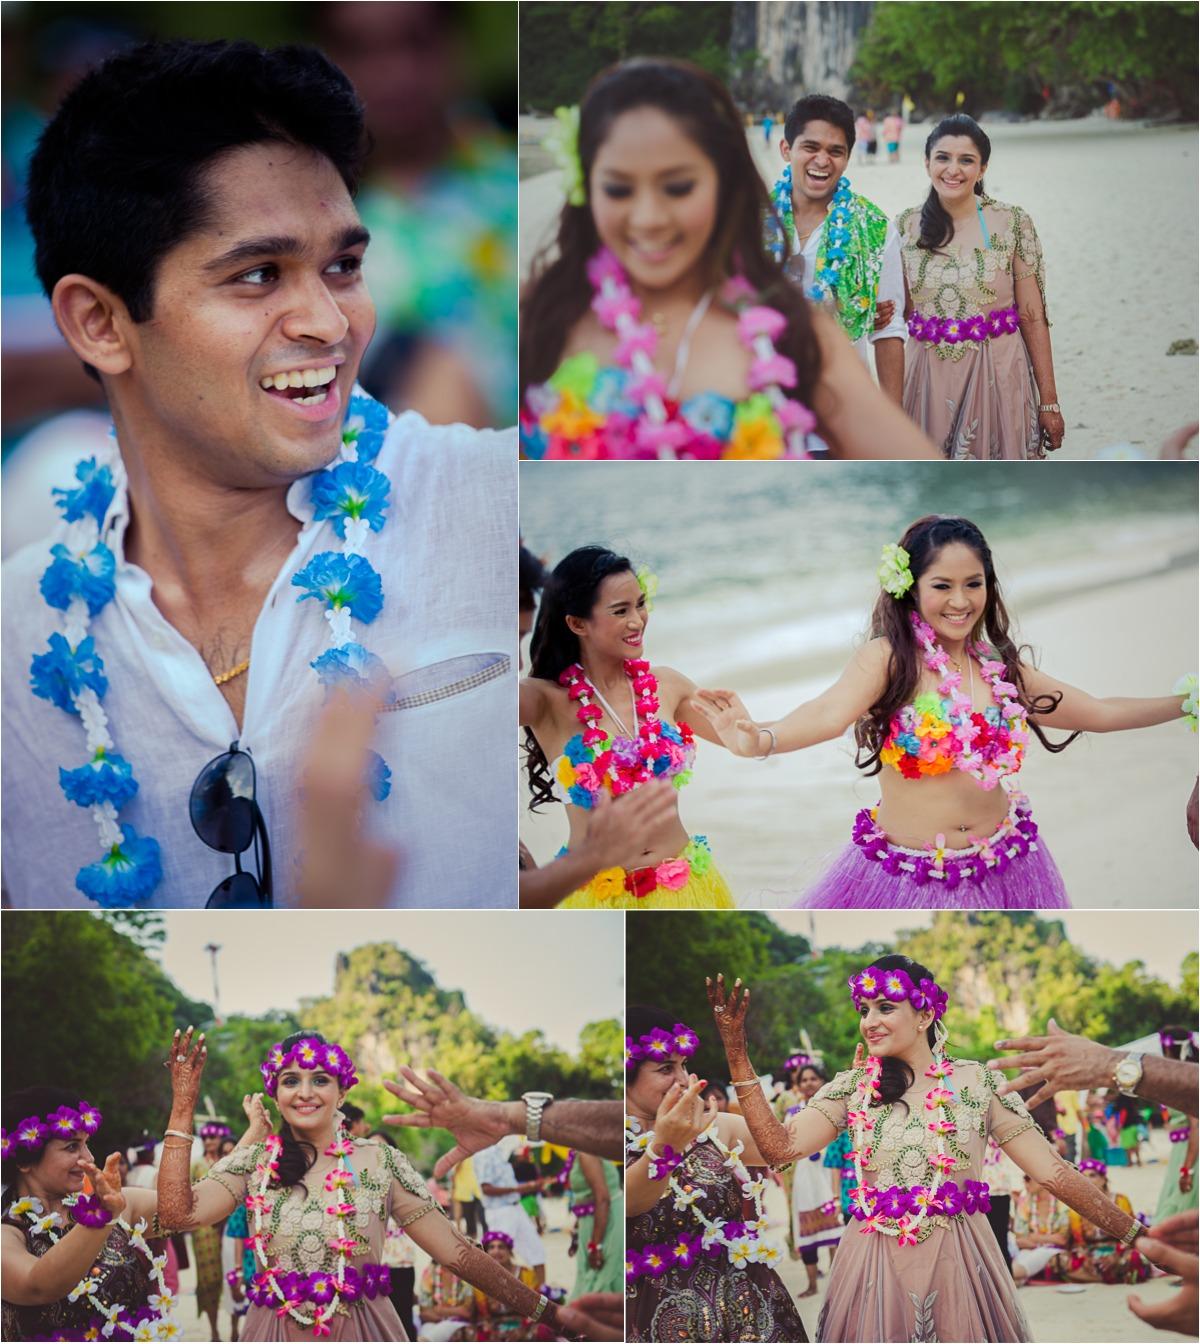 disha_rushi_thailand_wedding_018